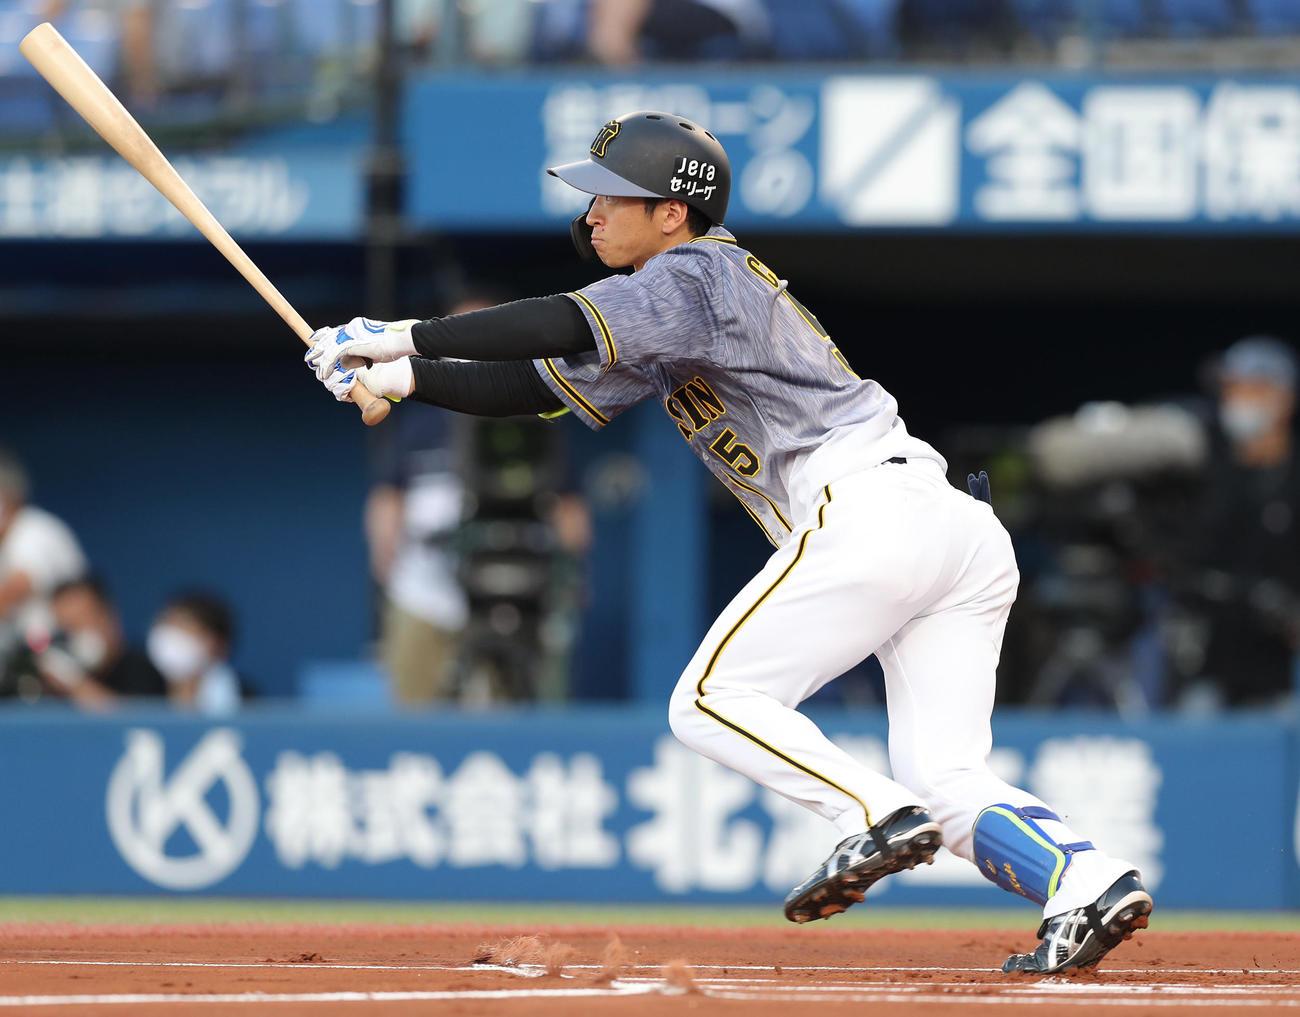 DeNA対阪神 1回裏阪神無死、右中間へ二塁打を放つ近本(撮影・前田充)